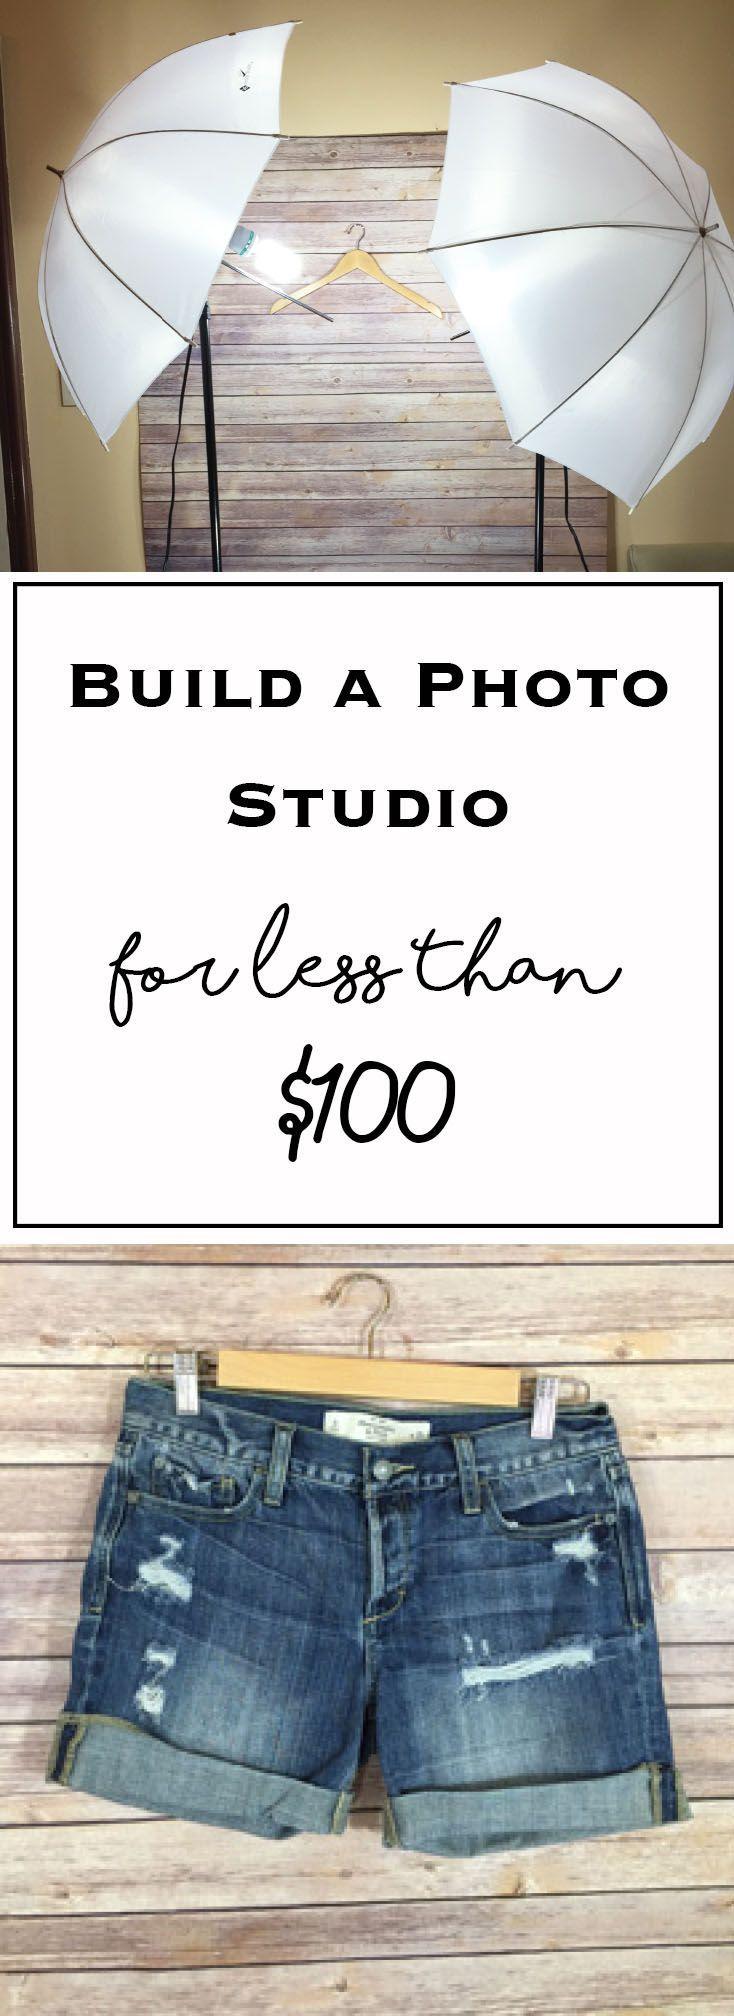 Art Digital Photography Professional Style Technique – Weddings